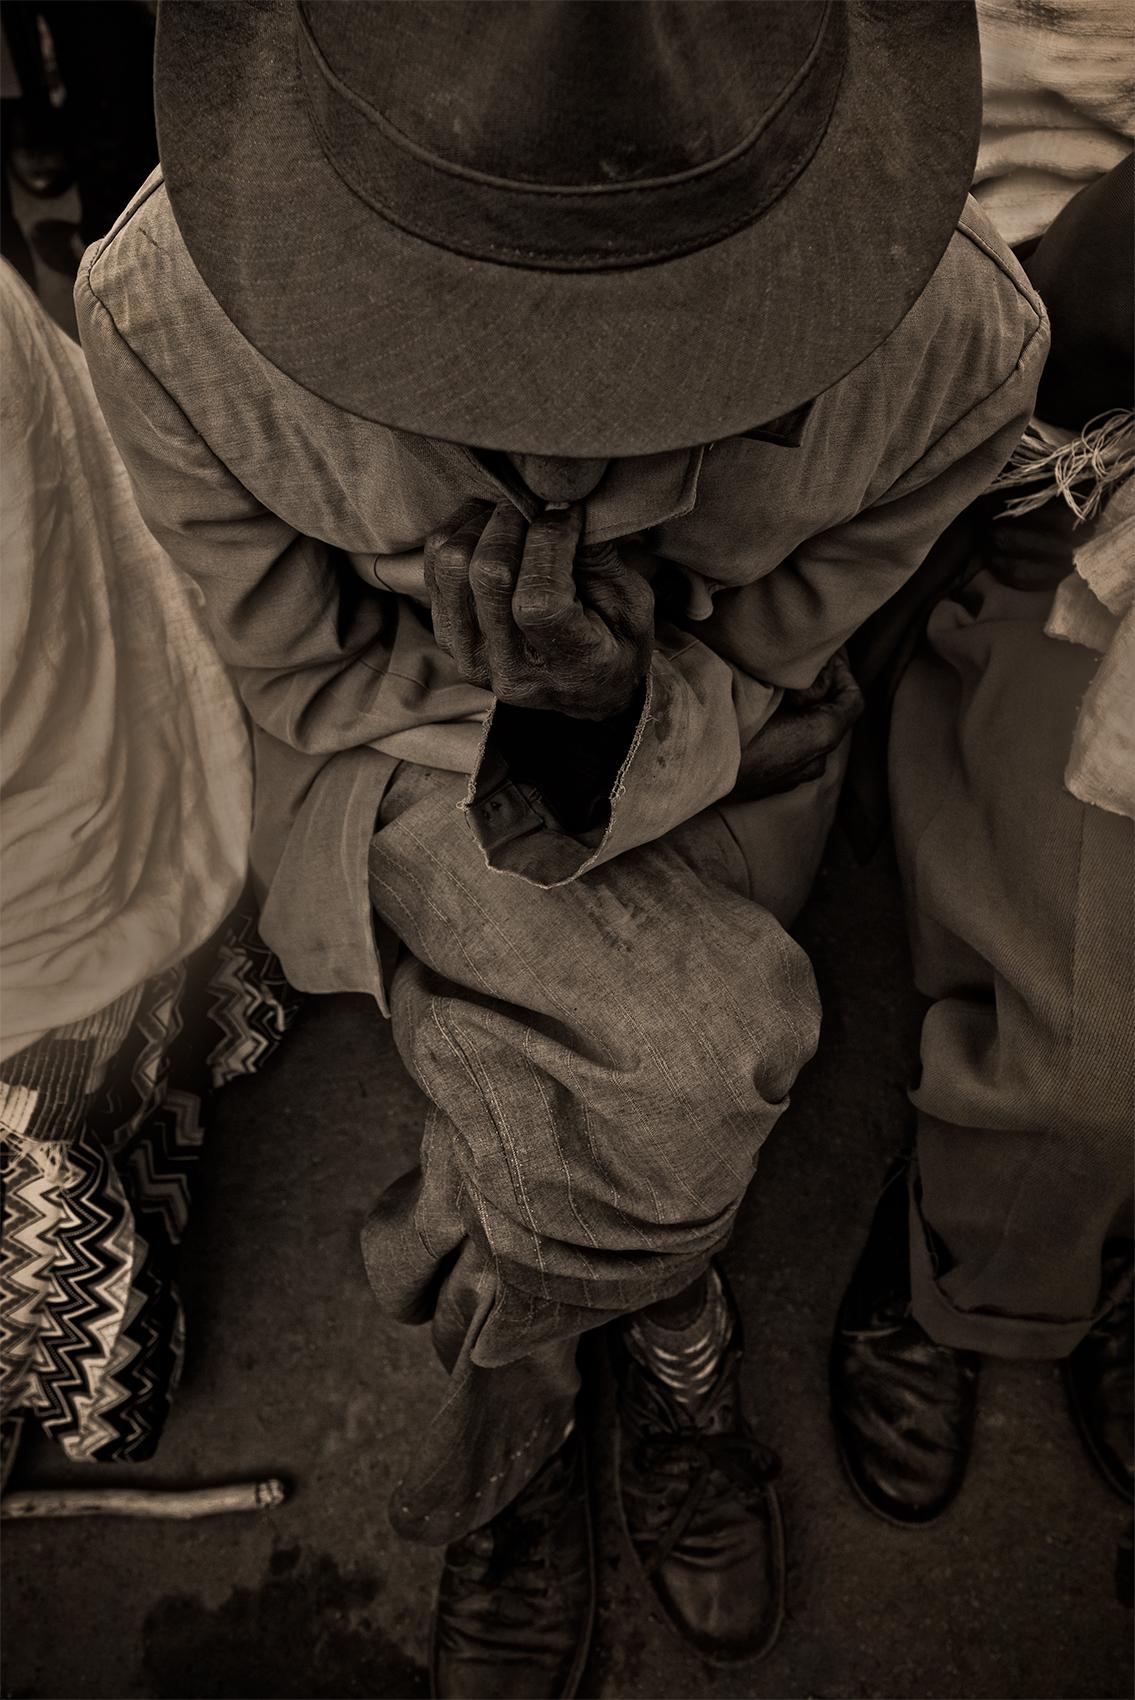 Blind man waiting, Masala, Ethiopia